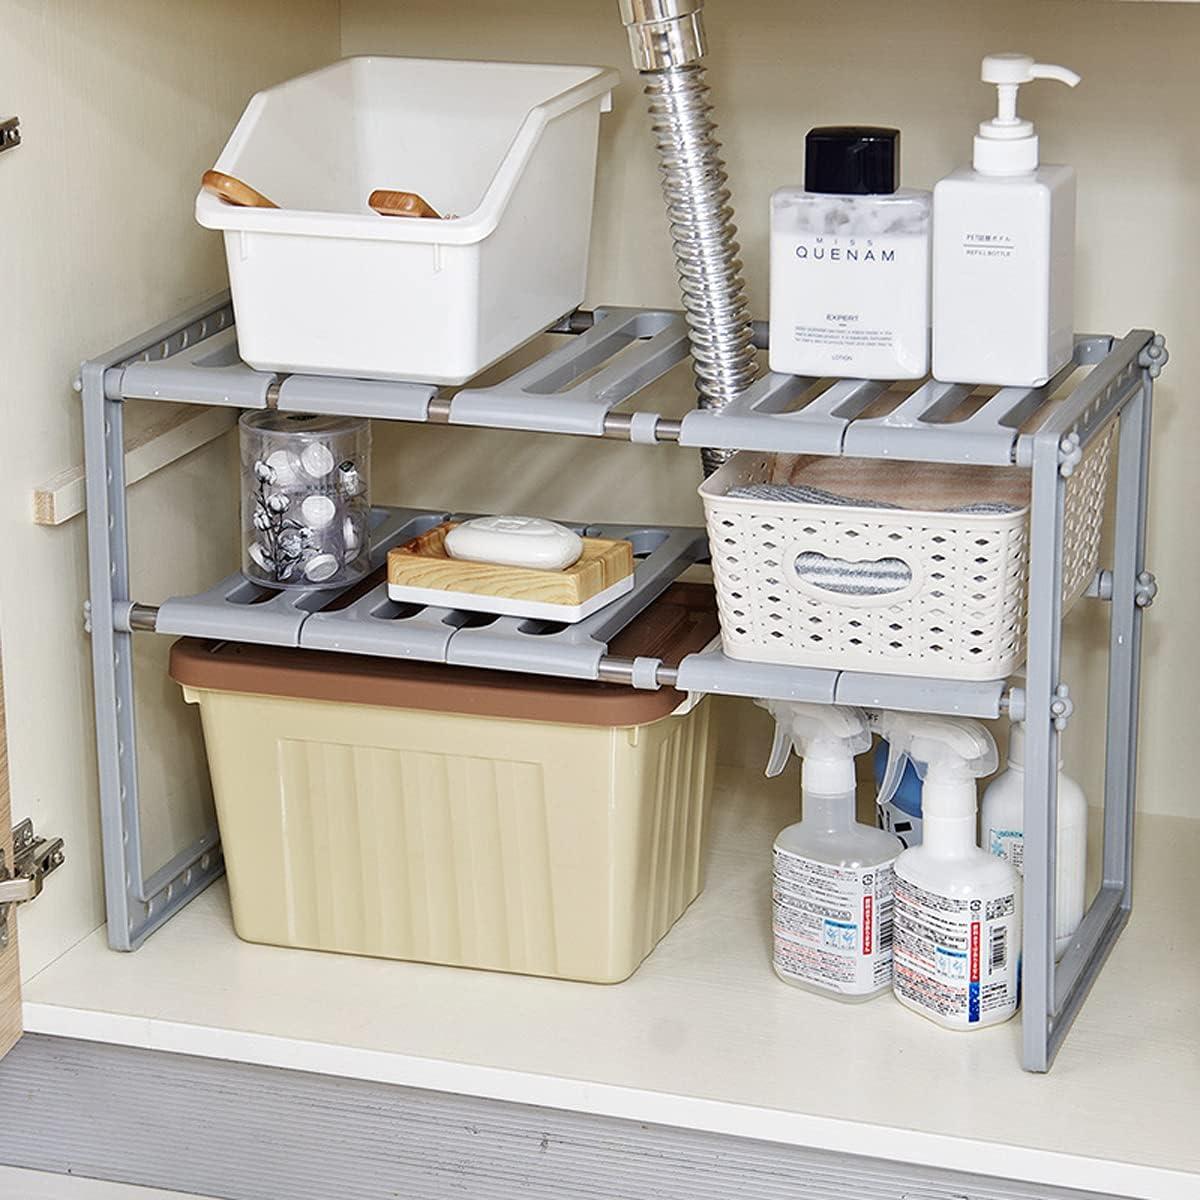 Buy Yancorp Under Sink 2 Tier Expandable Shelf Organizer Rack Under Sink Organizers And Storage Adjustable Shelf Organizer Rack For Kitchen Bathroom Grey Online In Indonesia B08p6p9tgl